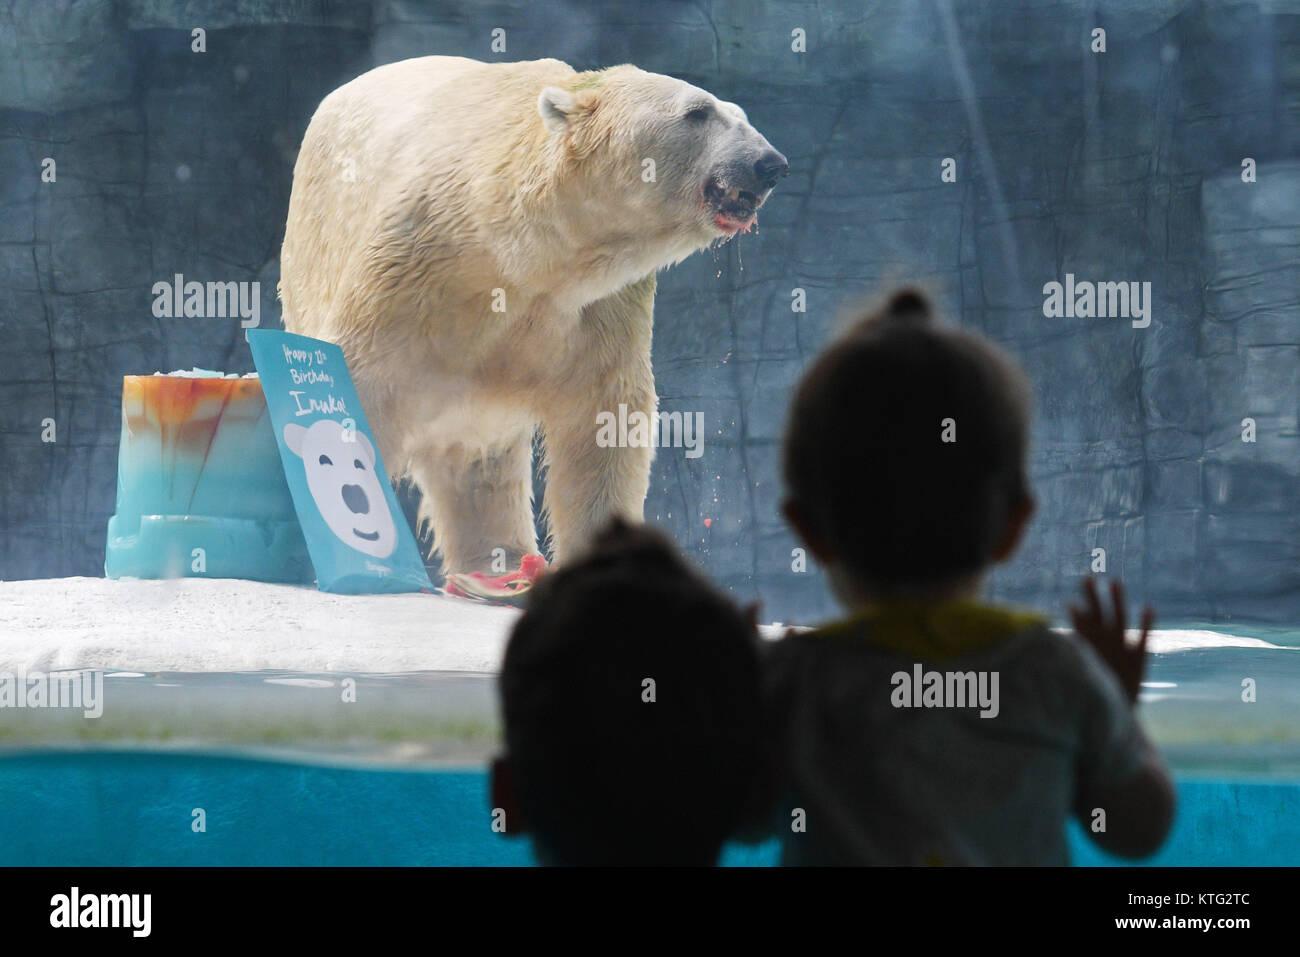 Polar Bear Eats Fish In Stock Photos & Polar Bear Eats Fish